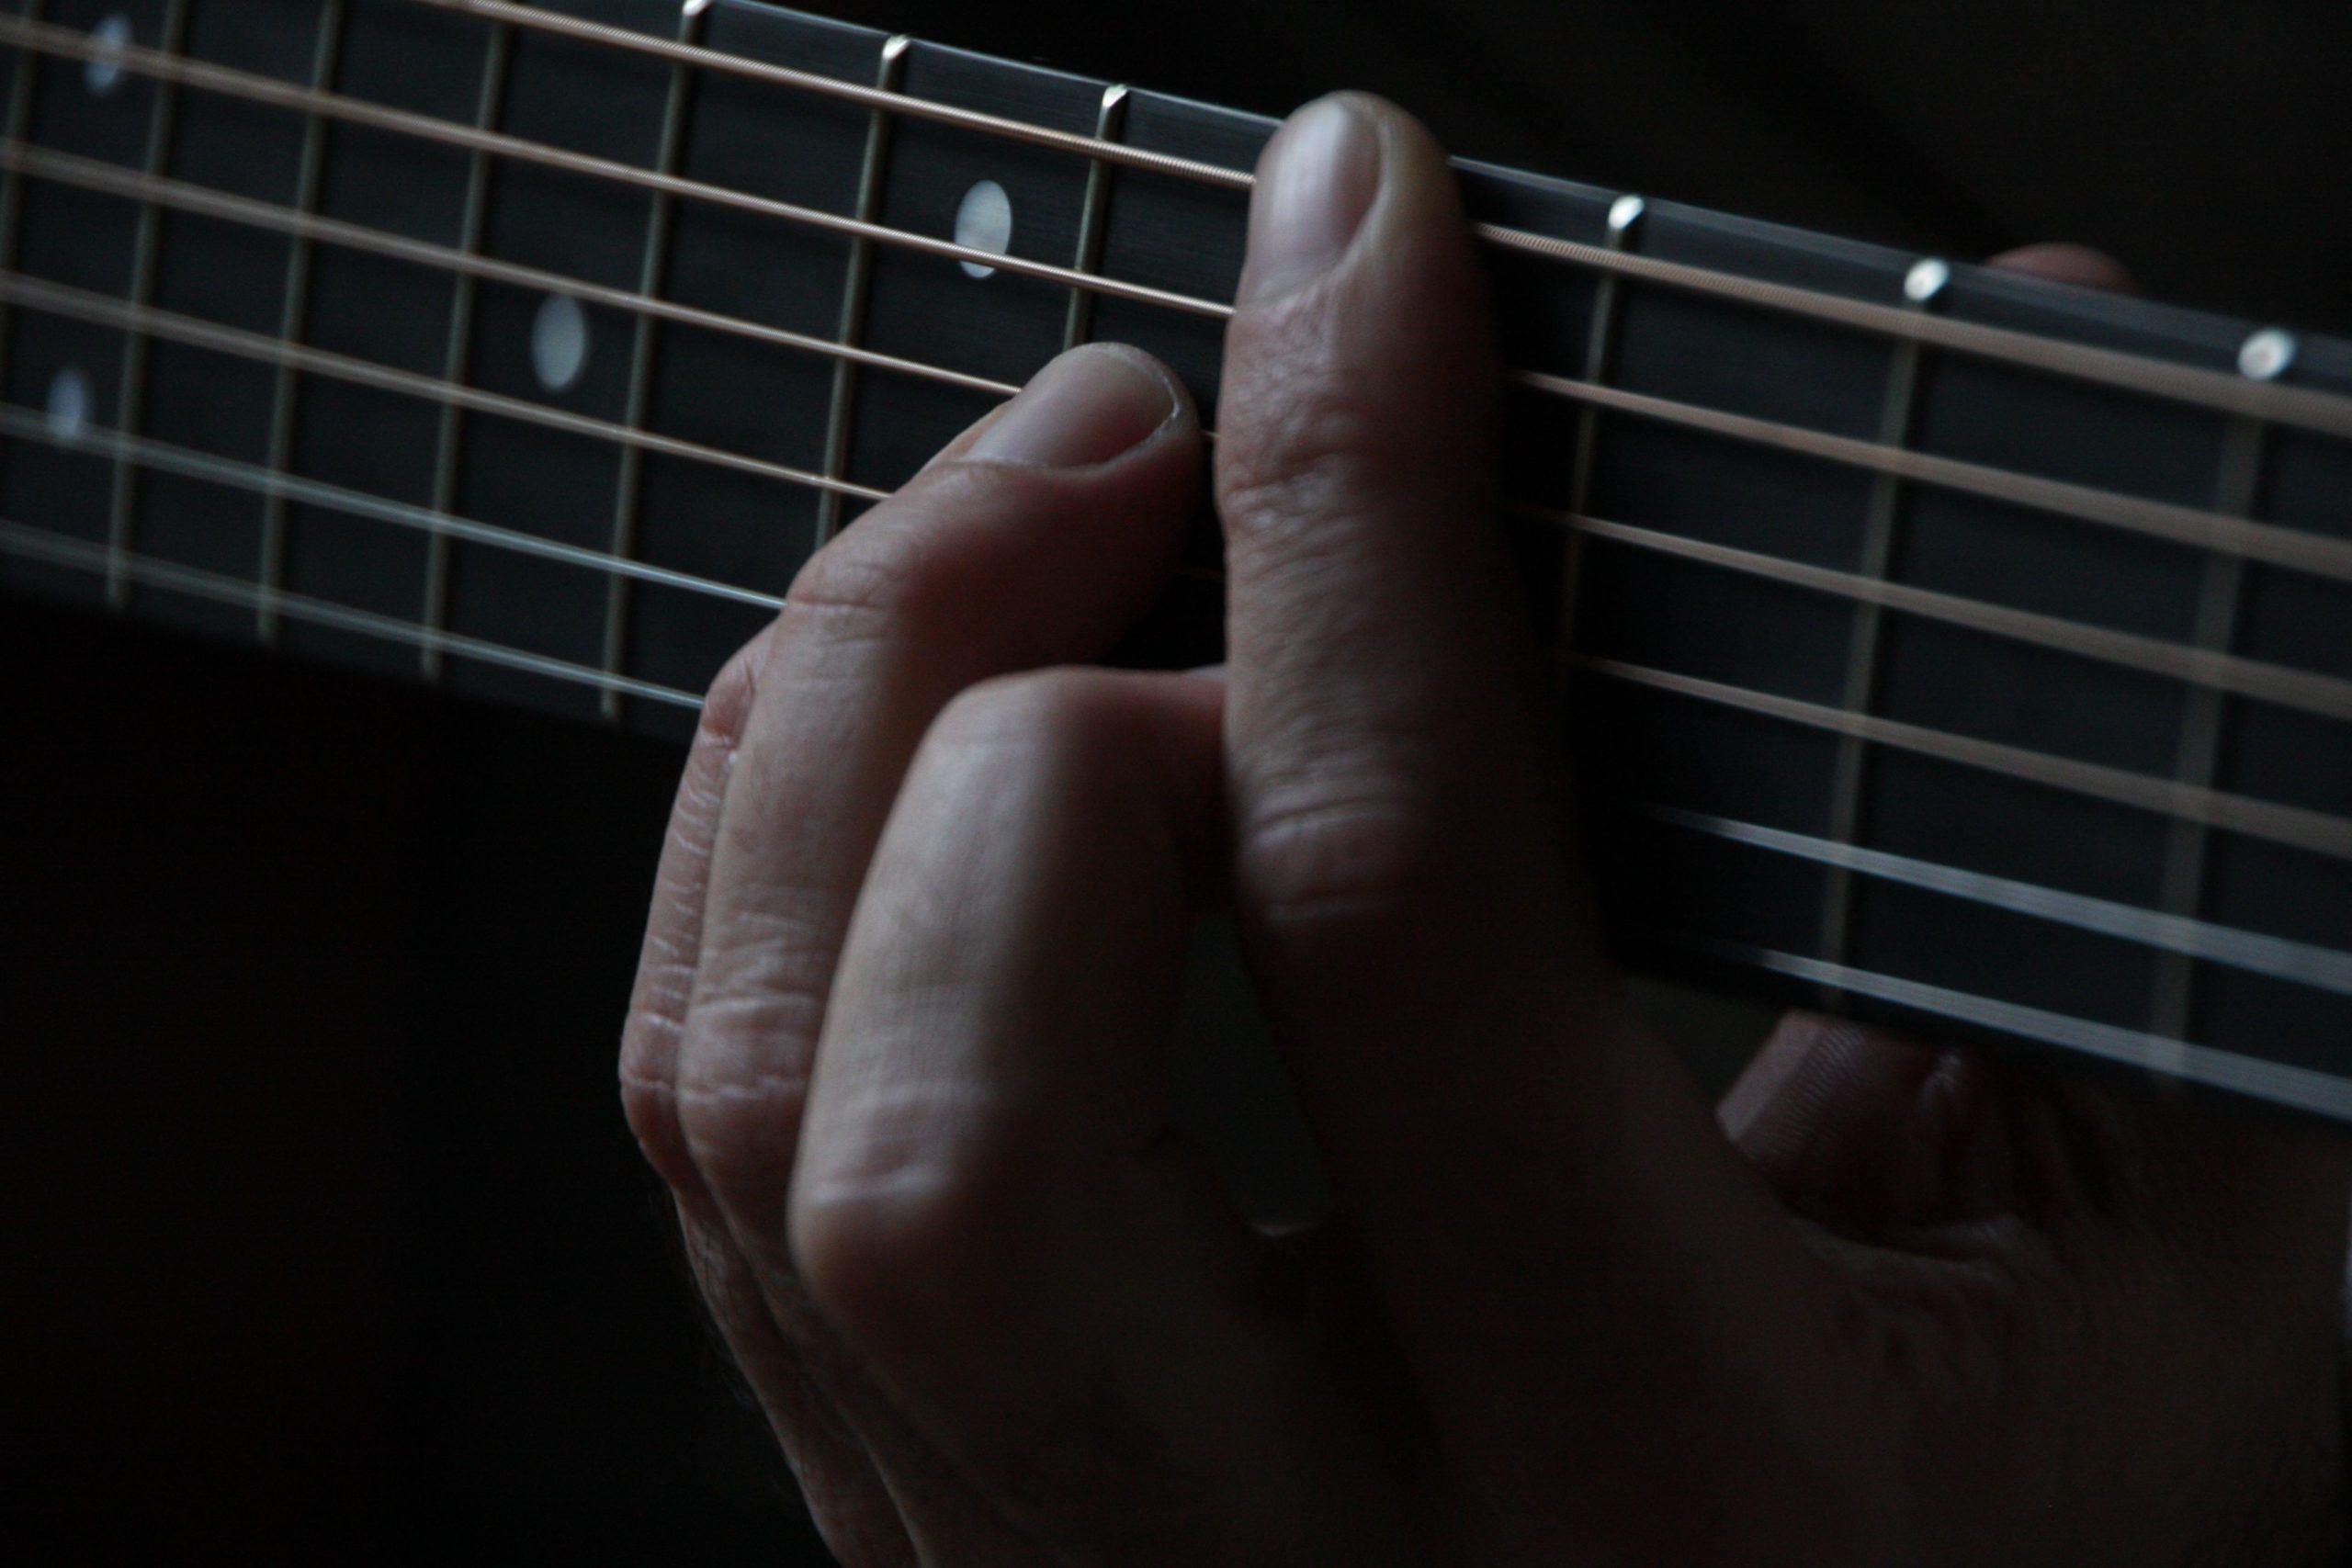 A-que-edad-se-aprende-guitarra